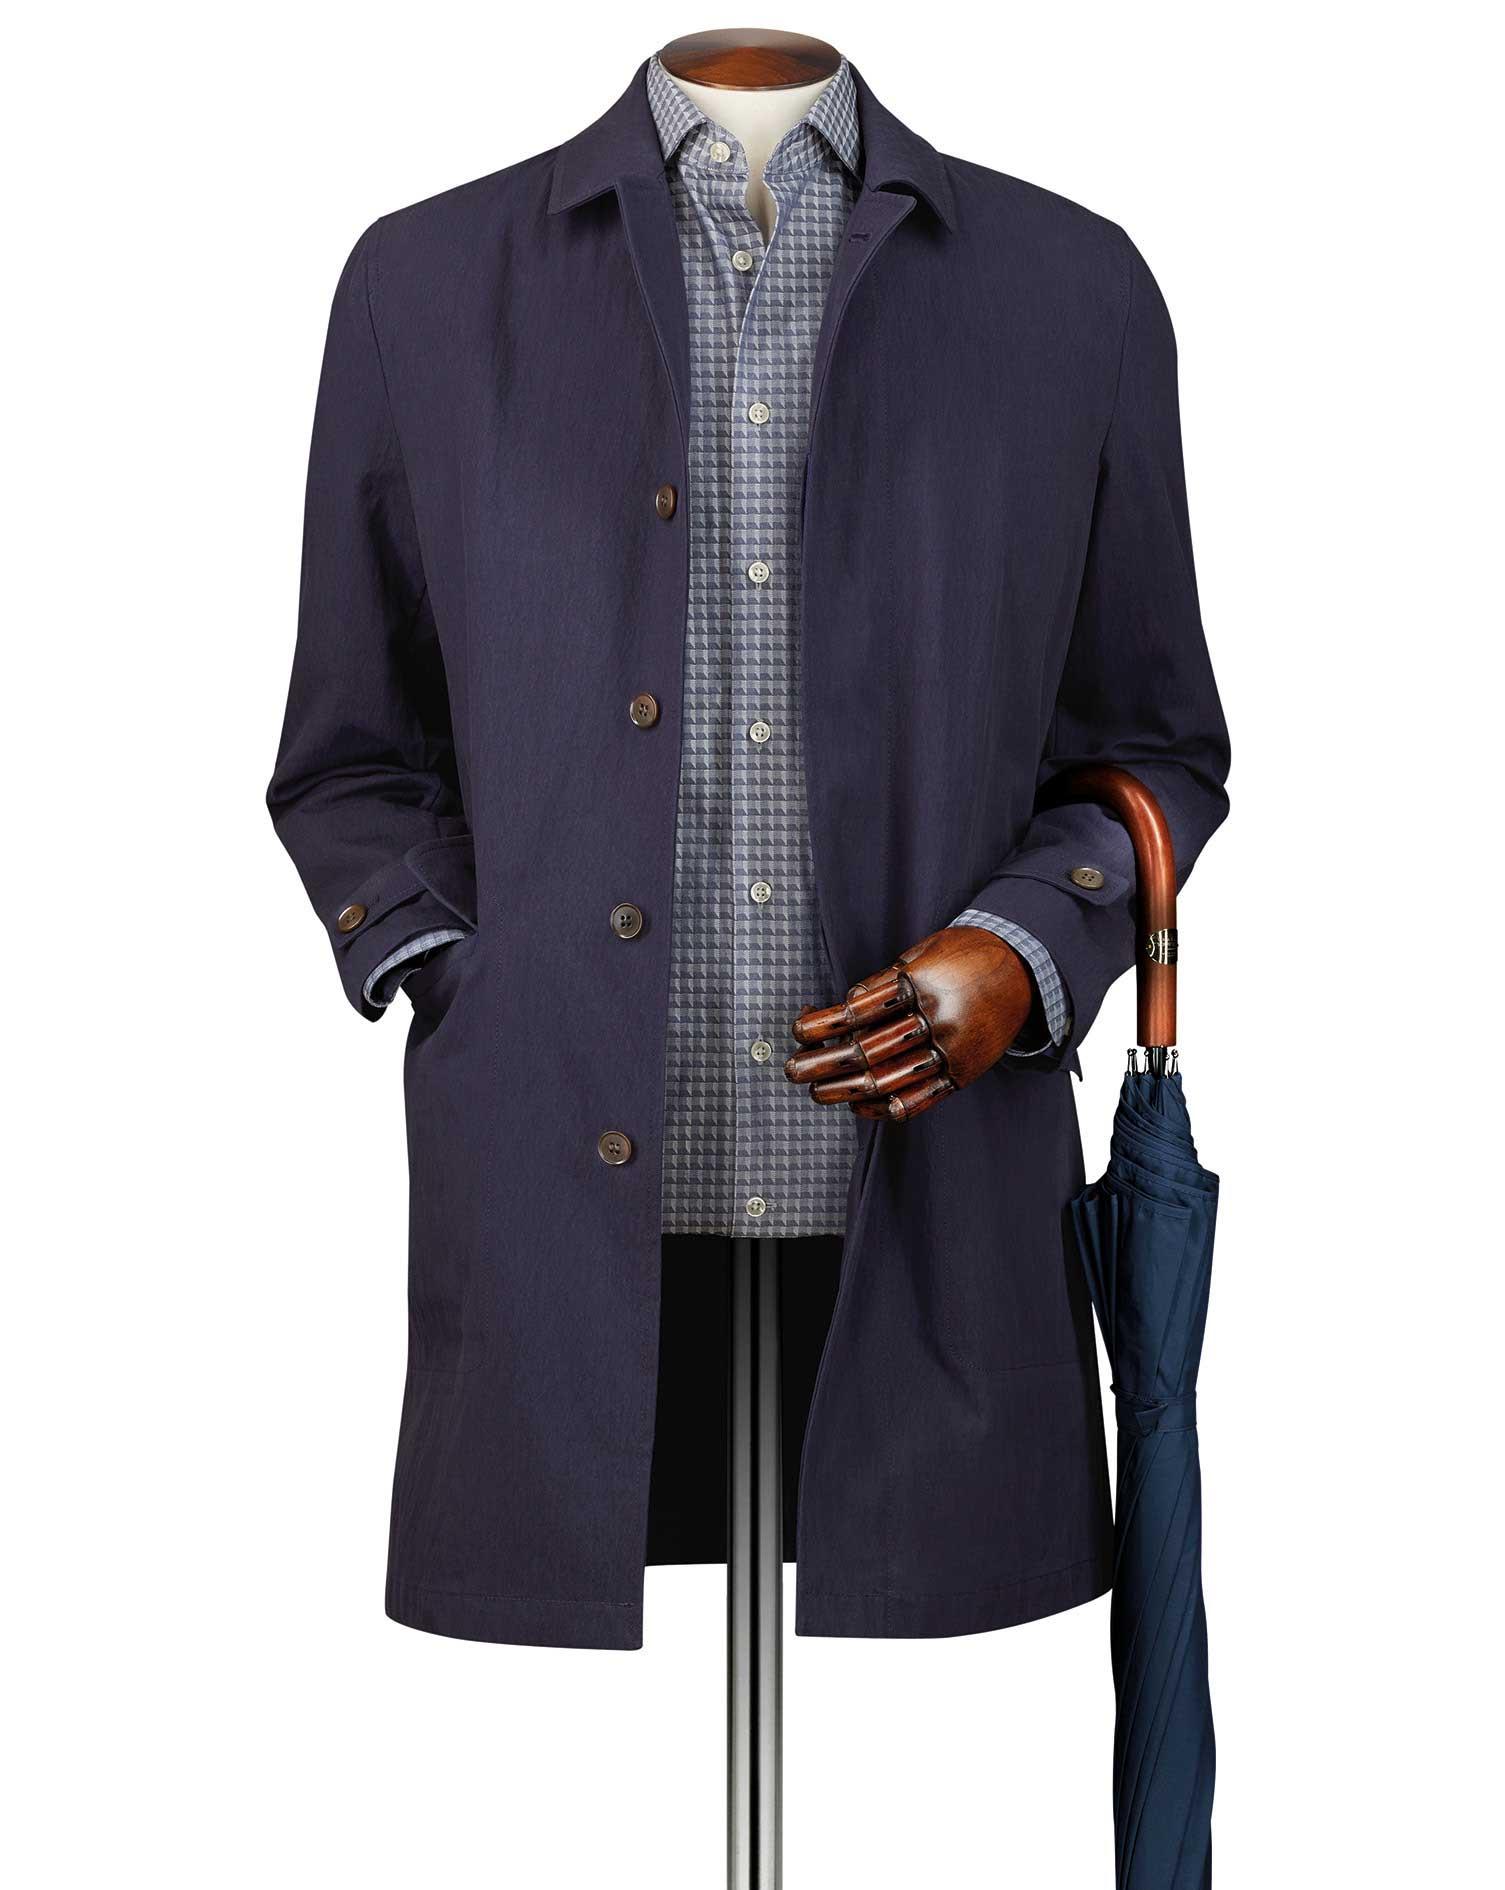 Navy Modern Mac Cotton Jacket Size 40 Regular by Charles Tyrwhitt